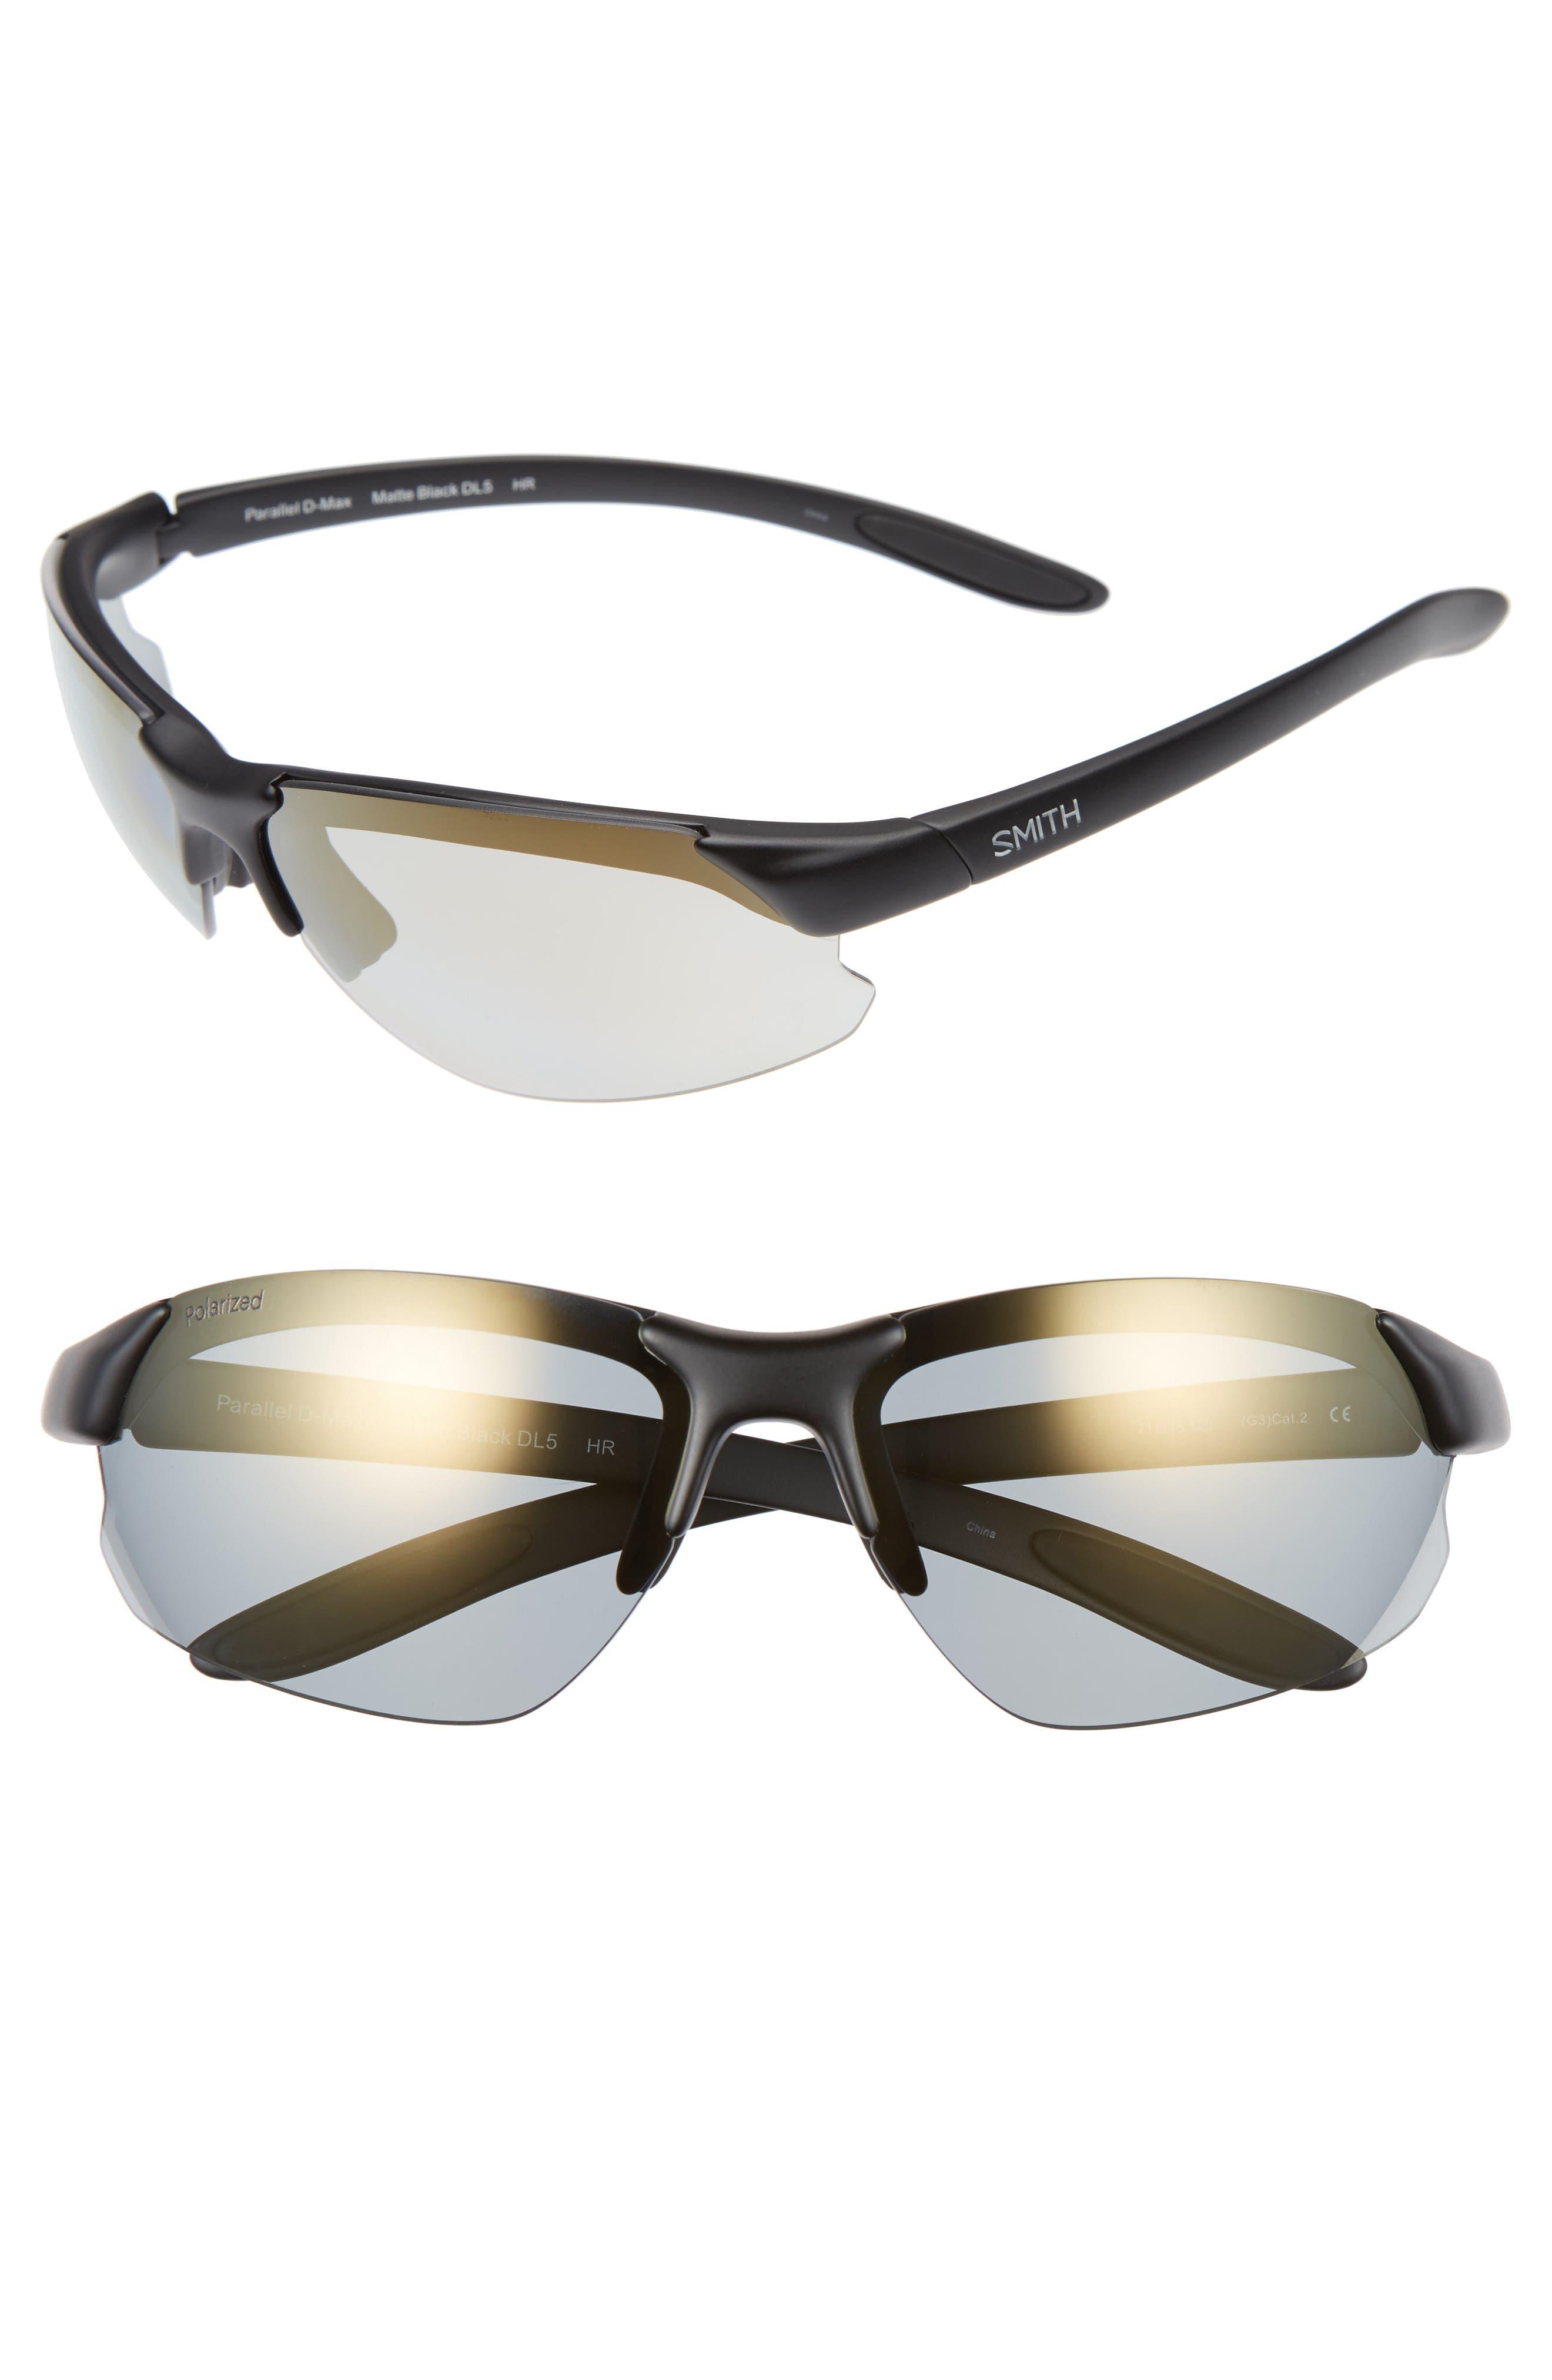 Parallel Max 69mm Polarized Sunglasses,                             Alternate thumbnail 2, color,                             001